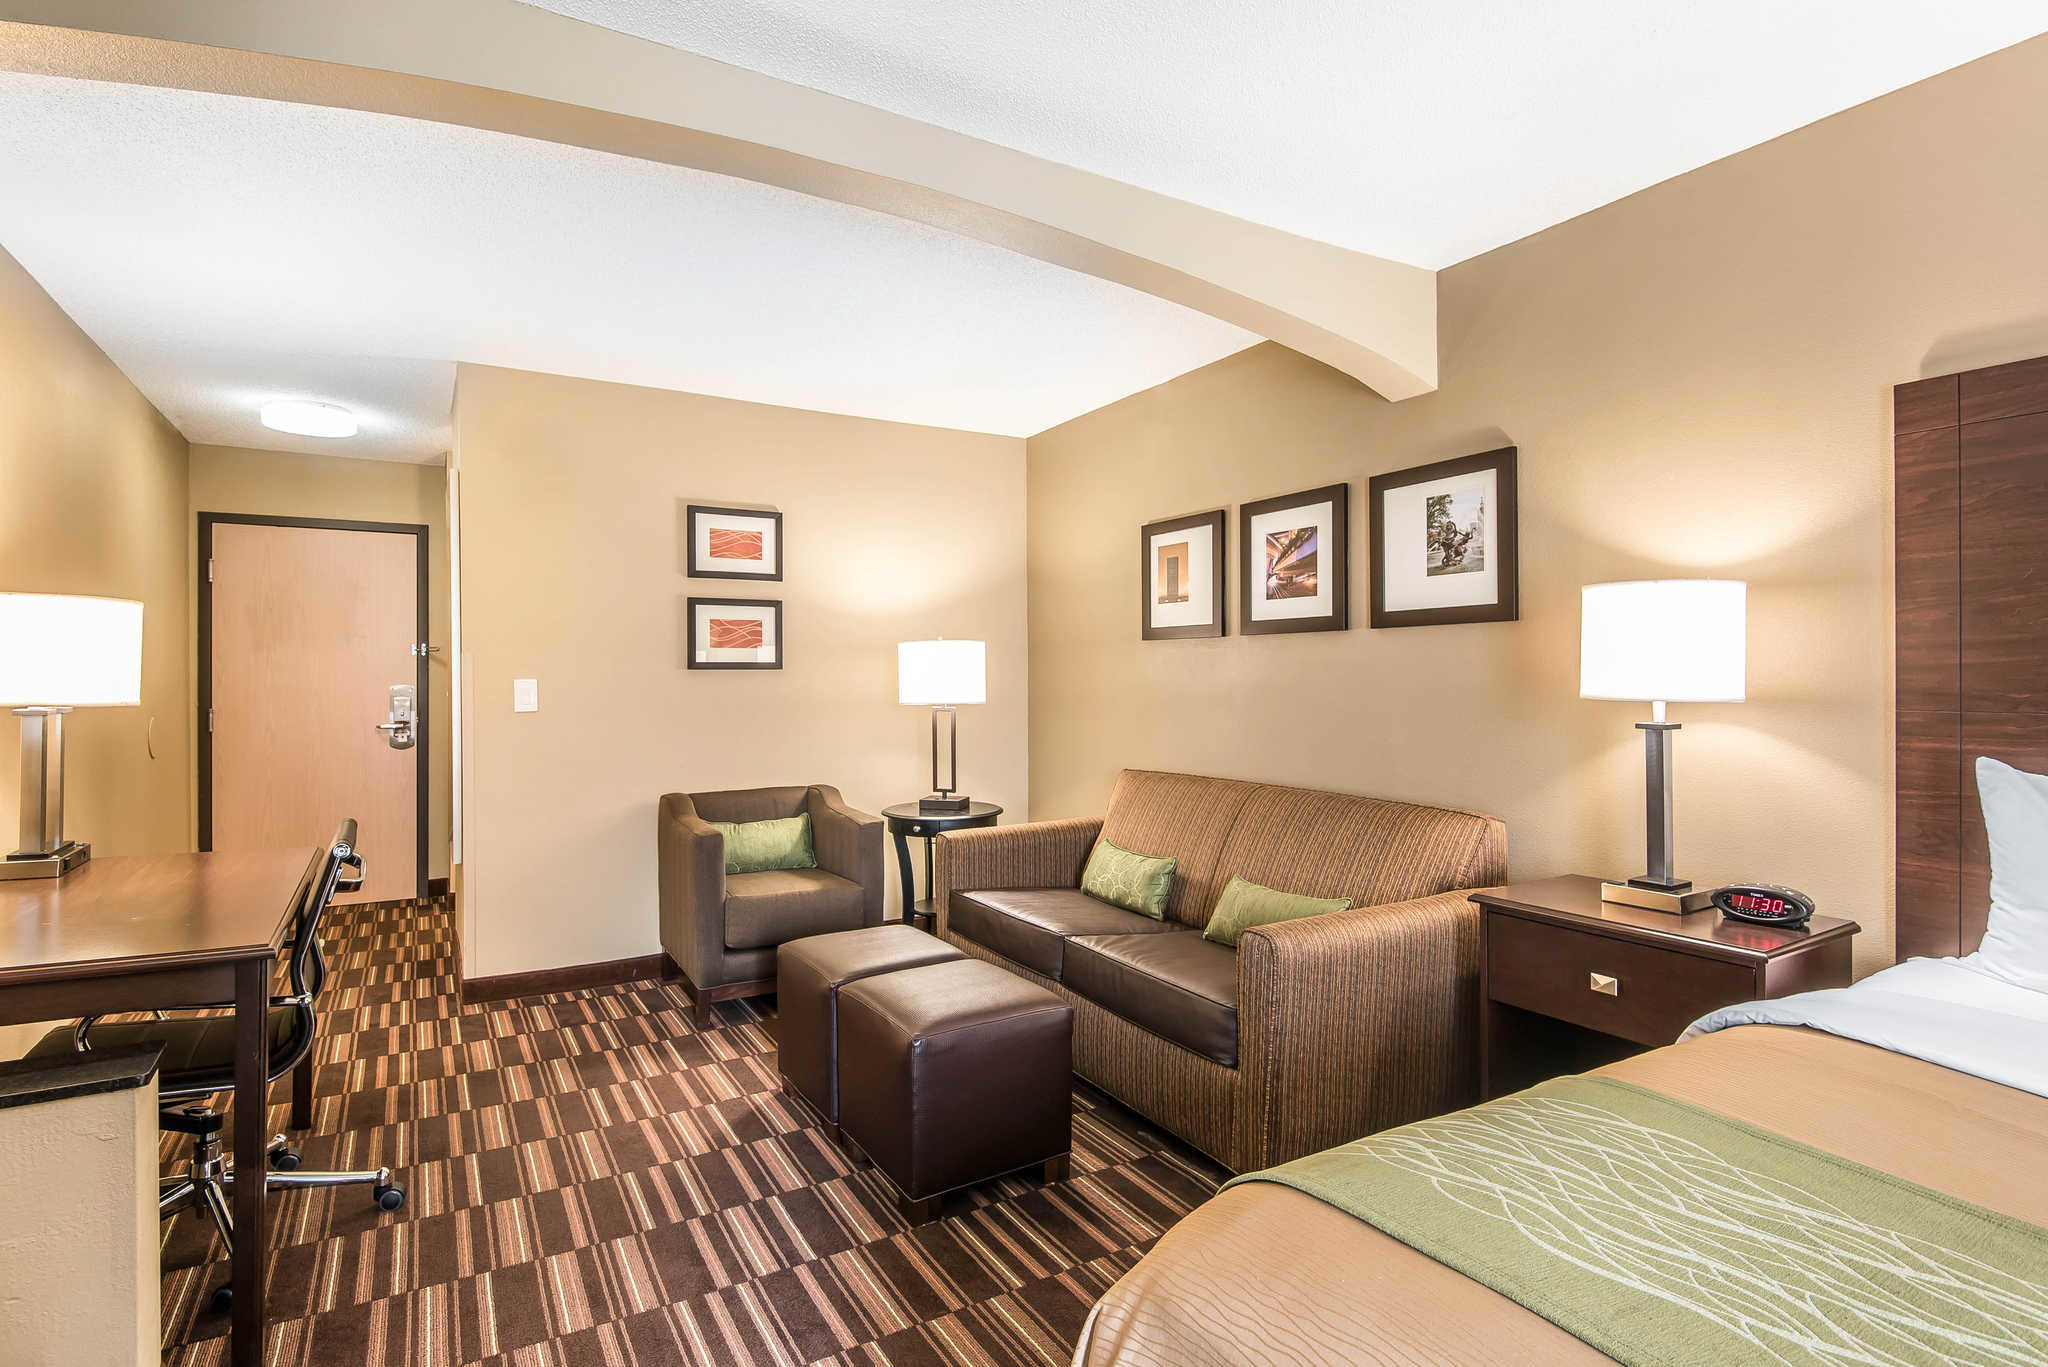 Comfort Inn & Suites Kansas City - Northeast image 21